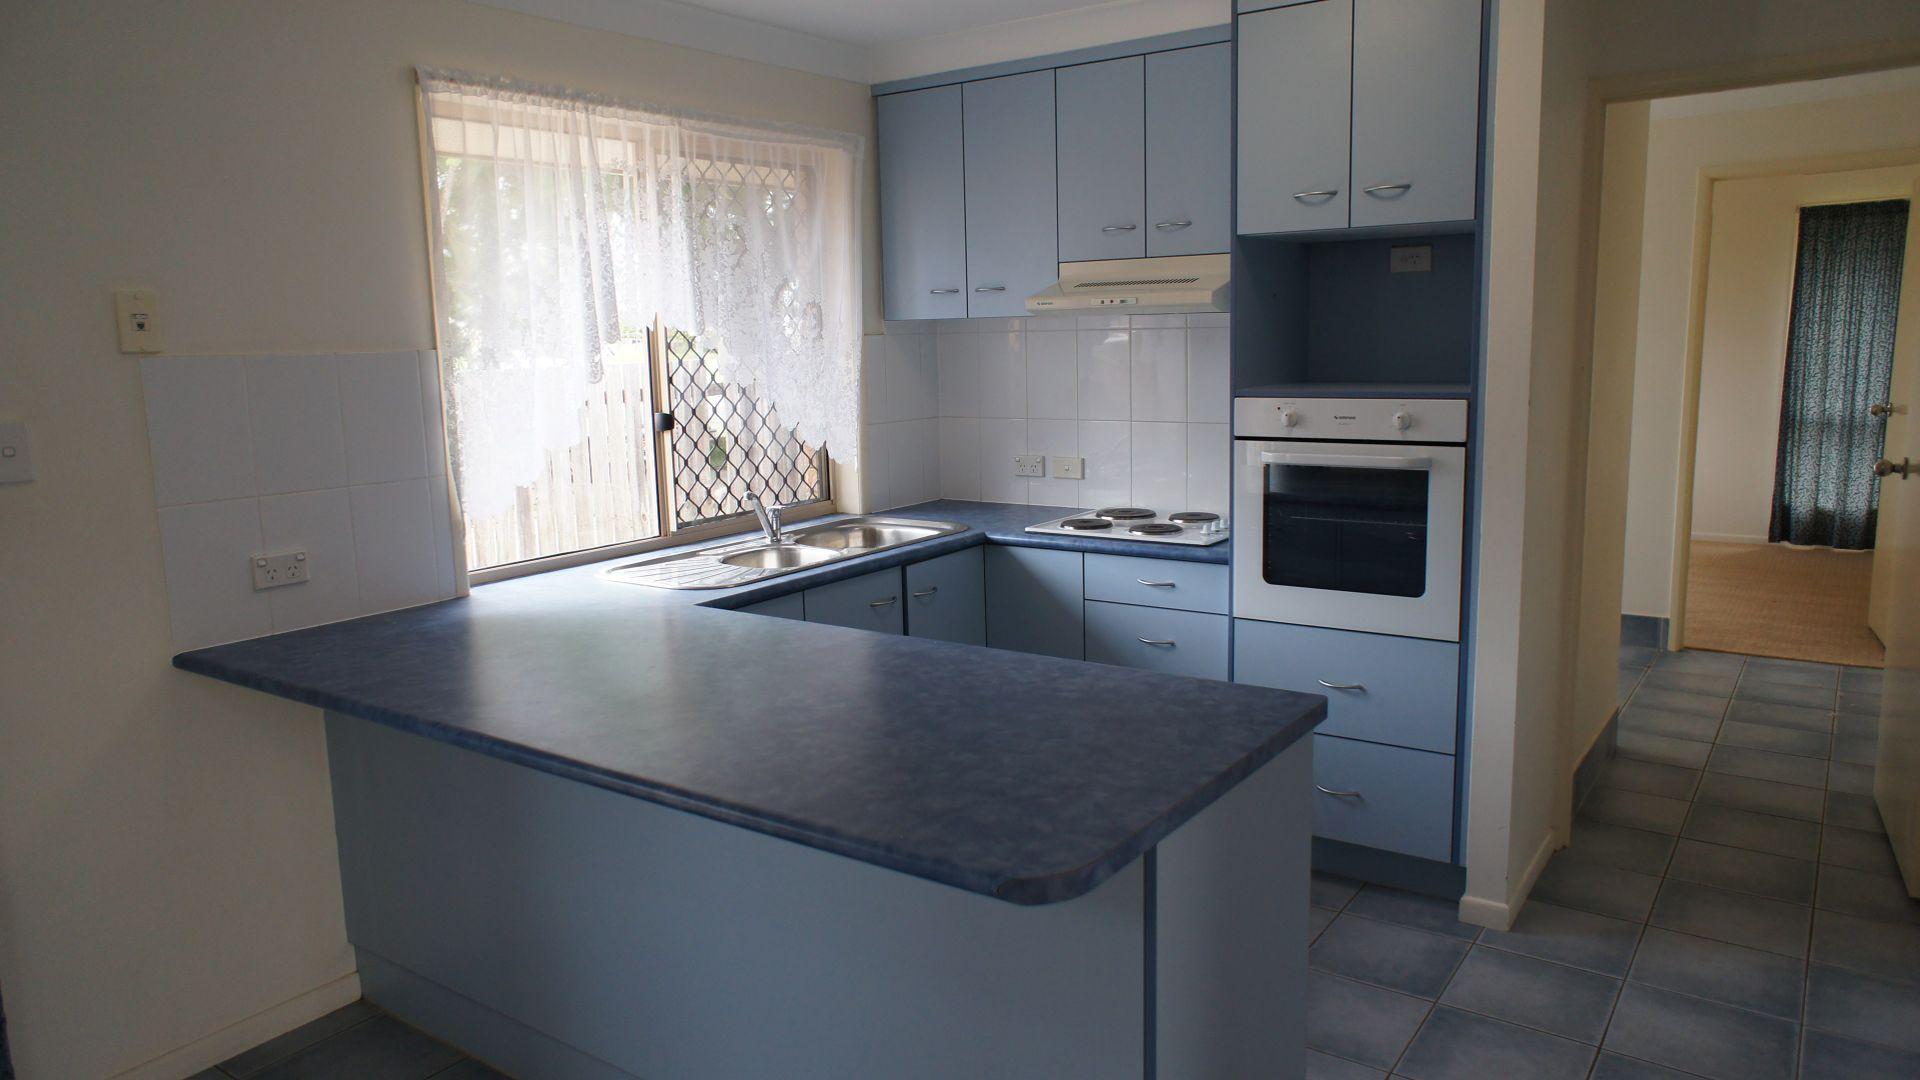 7/238 Barolin Street, Avenell Heights QLD 4670, Image 1